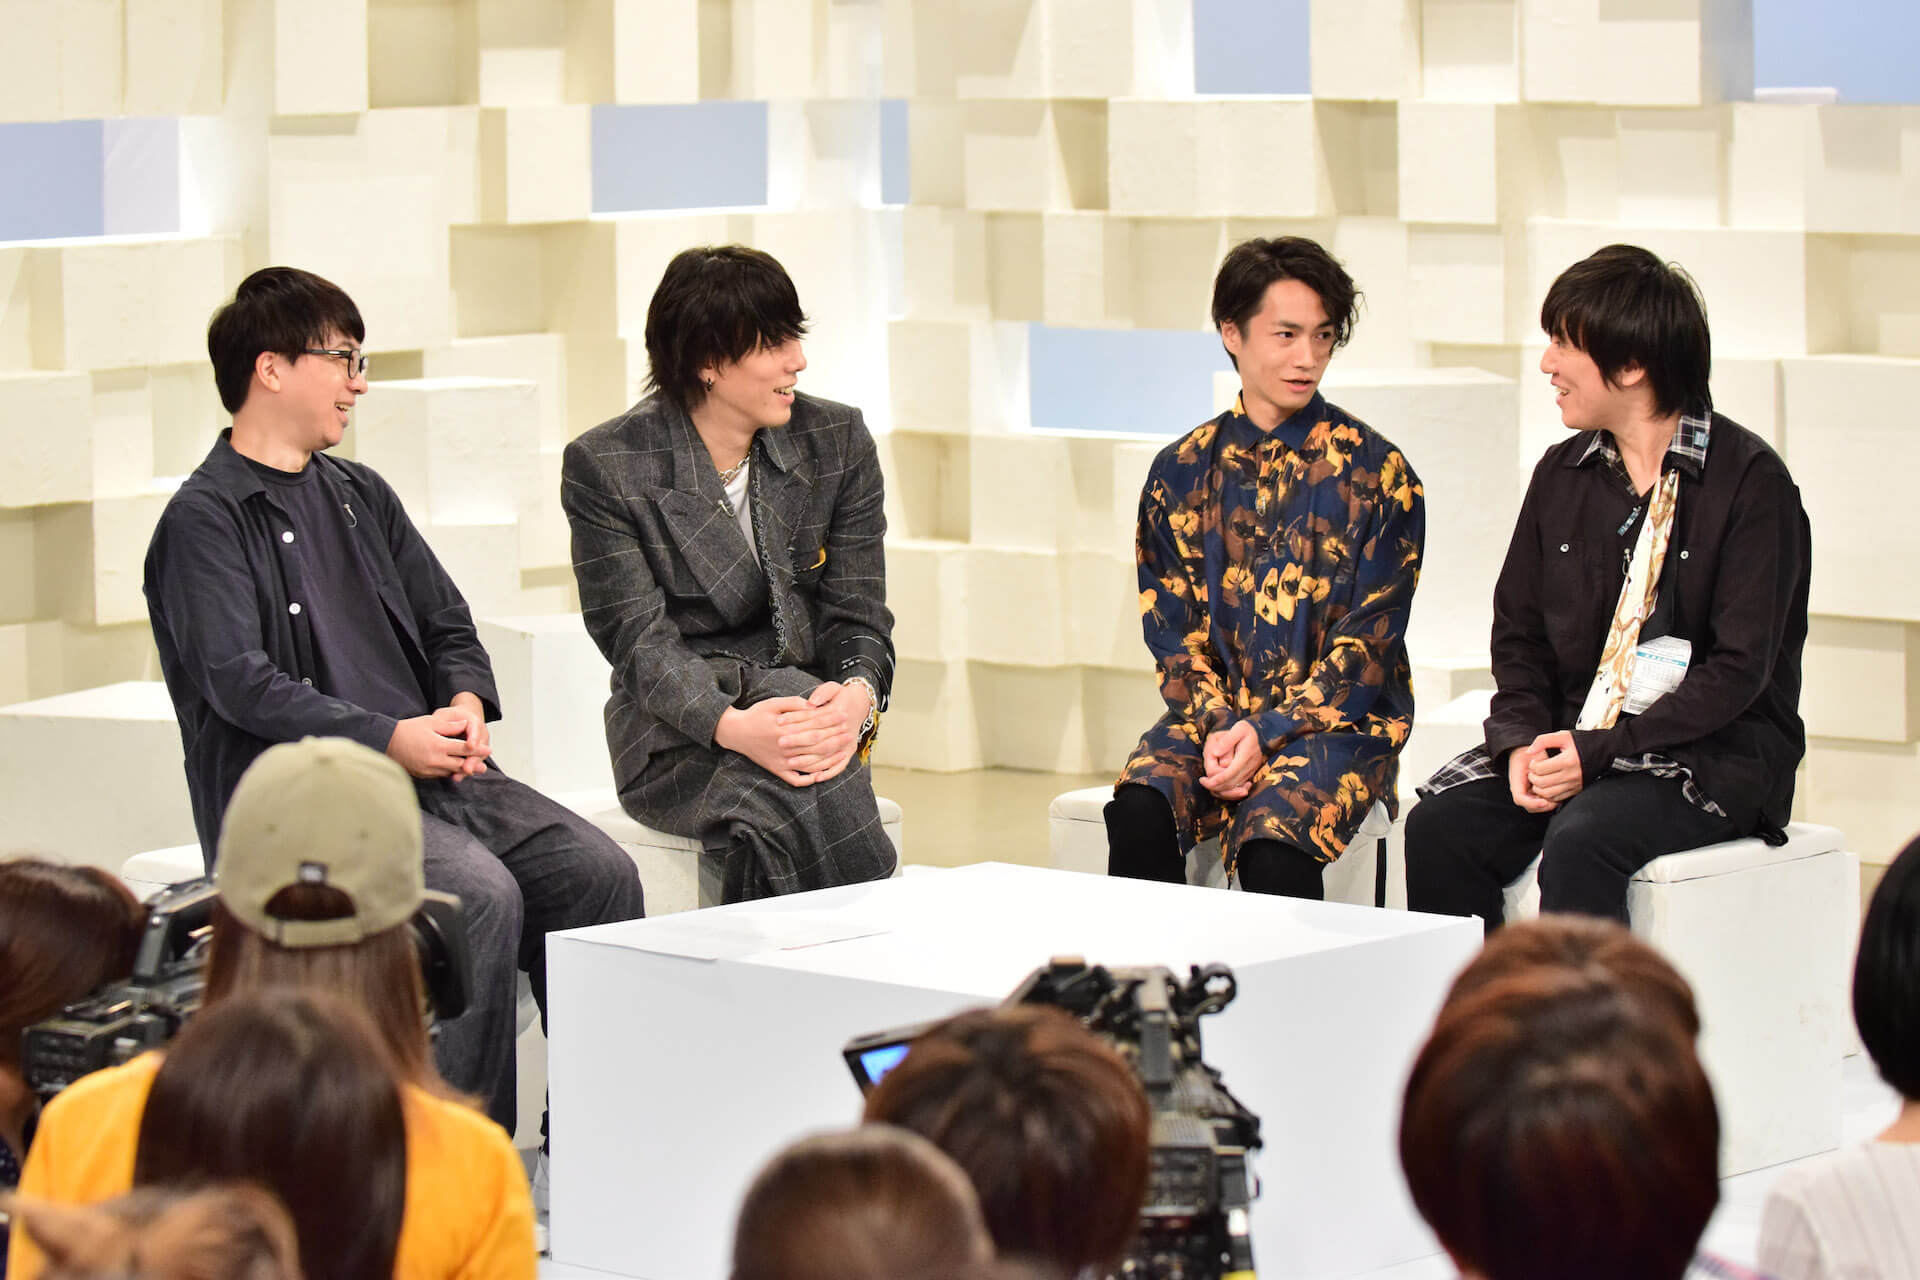 RADWIMPS、NHK総合にて「天気の子」特集番組の放送が決定!4曲のパフォーマンスを披露 art191023_radwimps_nhk_1